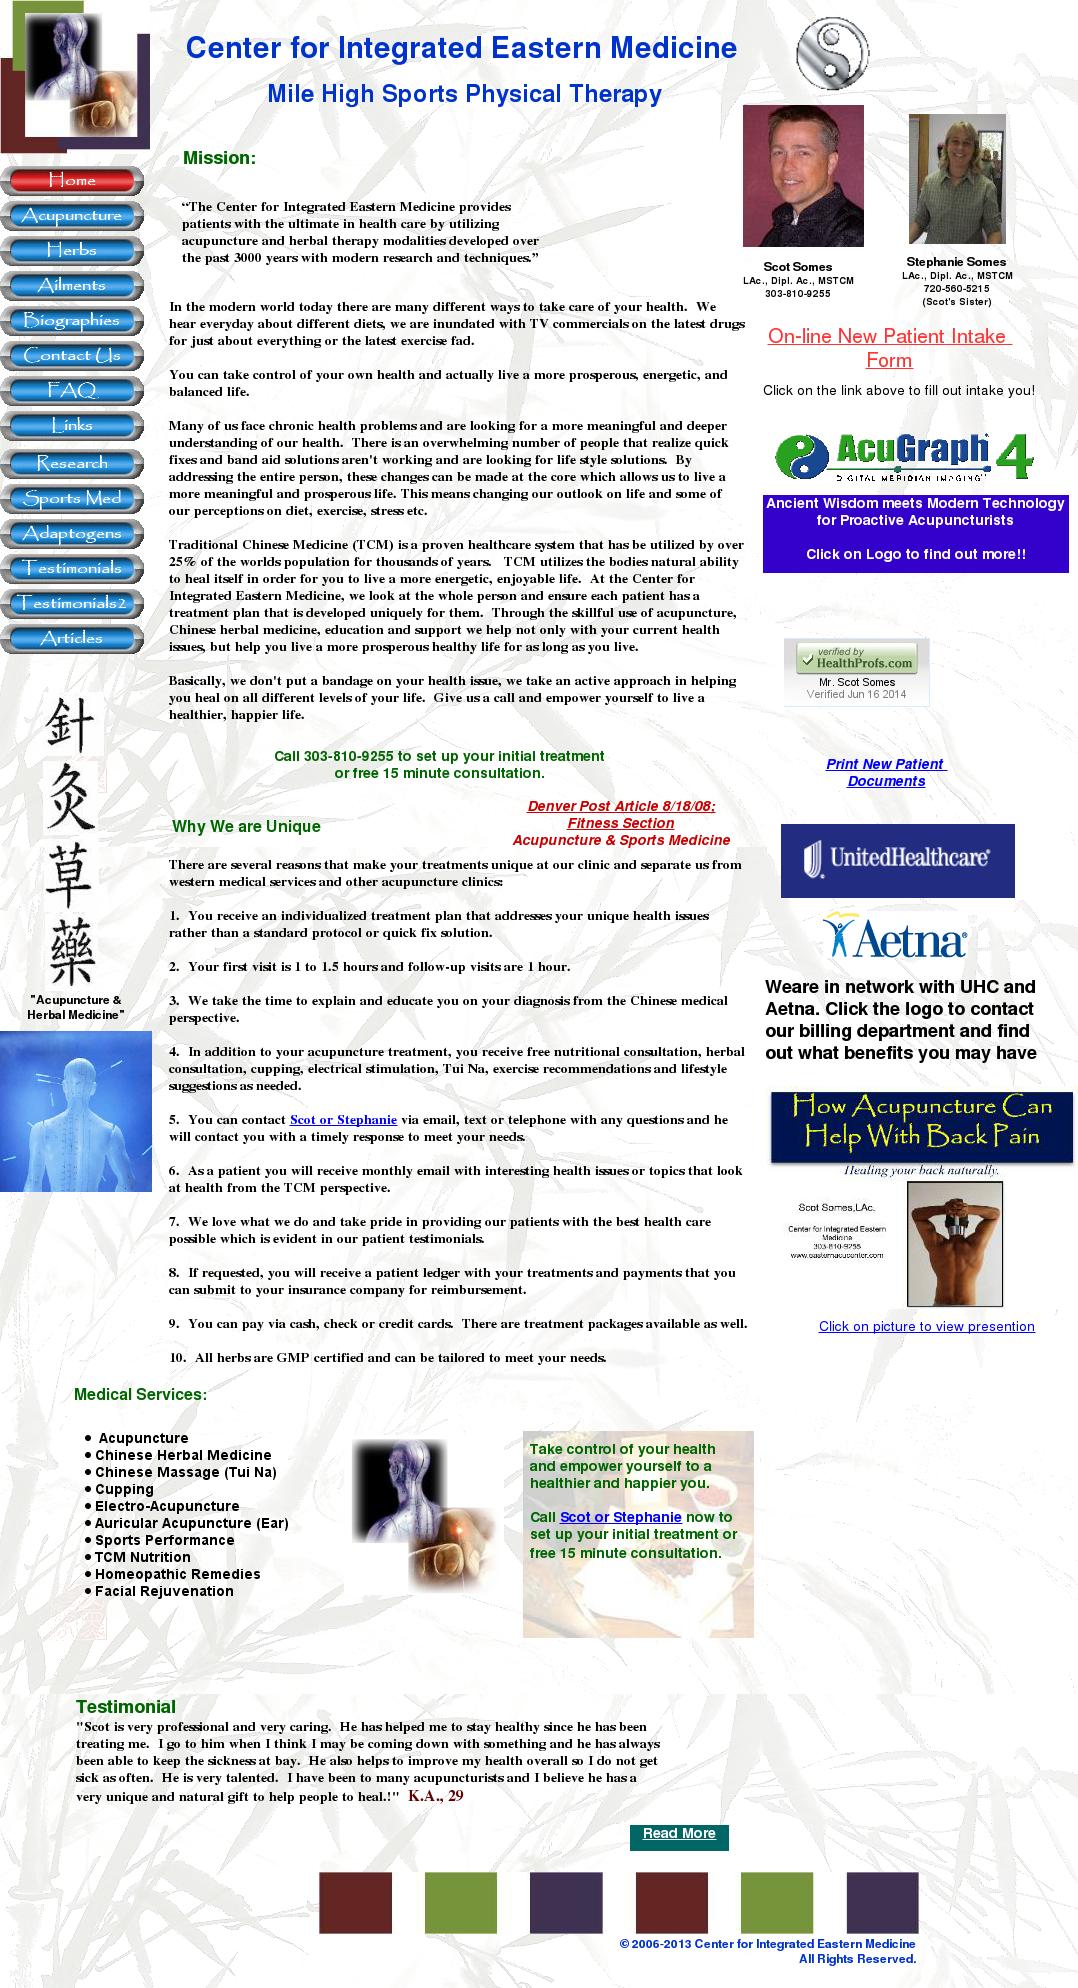 Center for Integrated Medicine Competitors, Revenue and